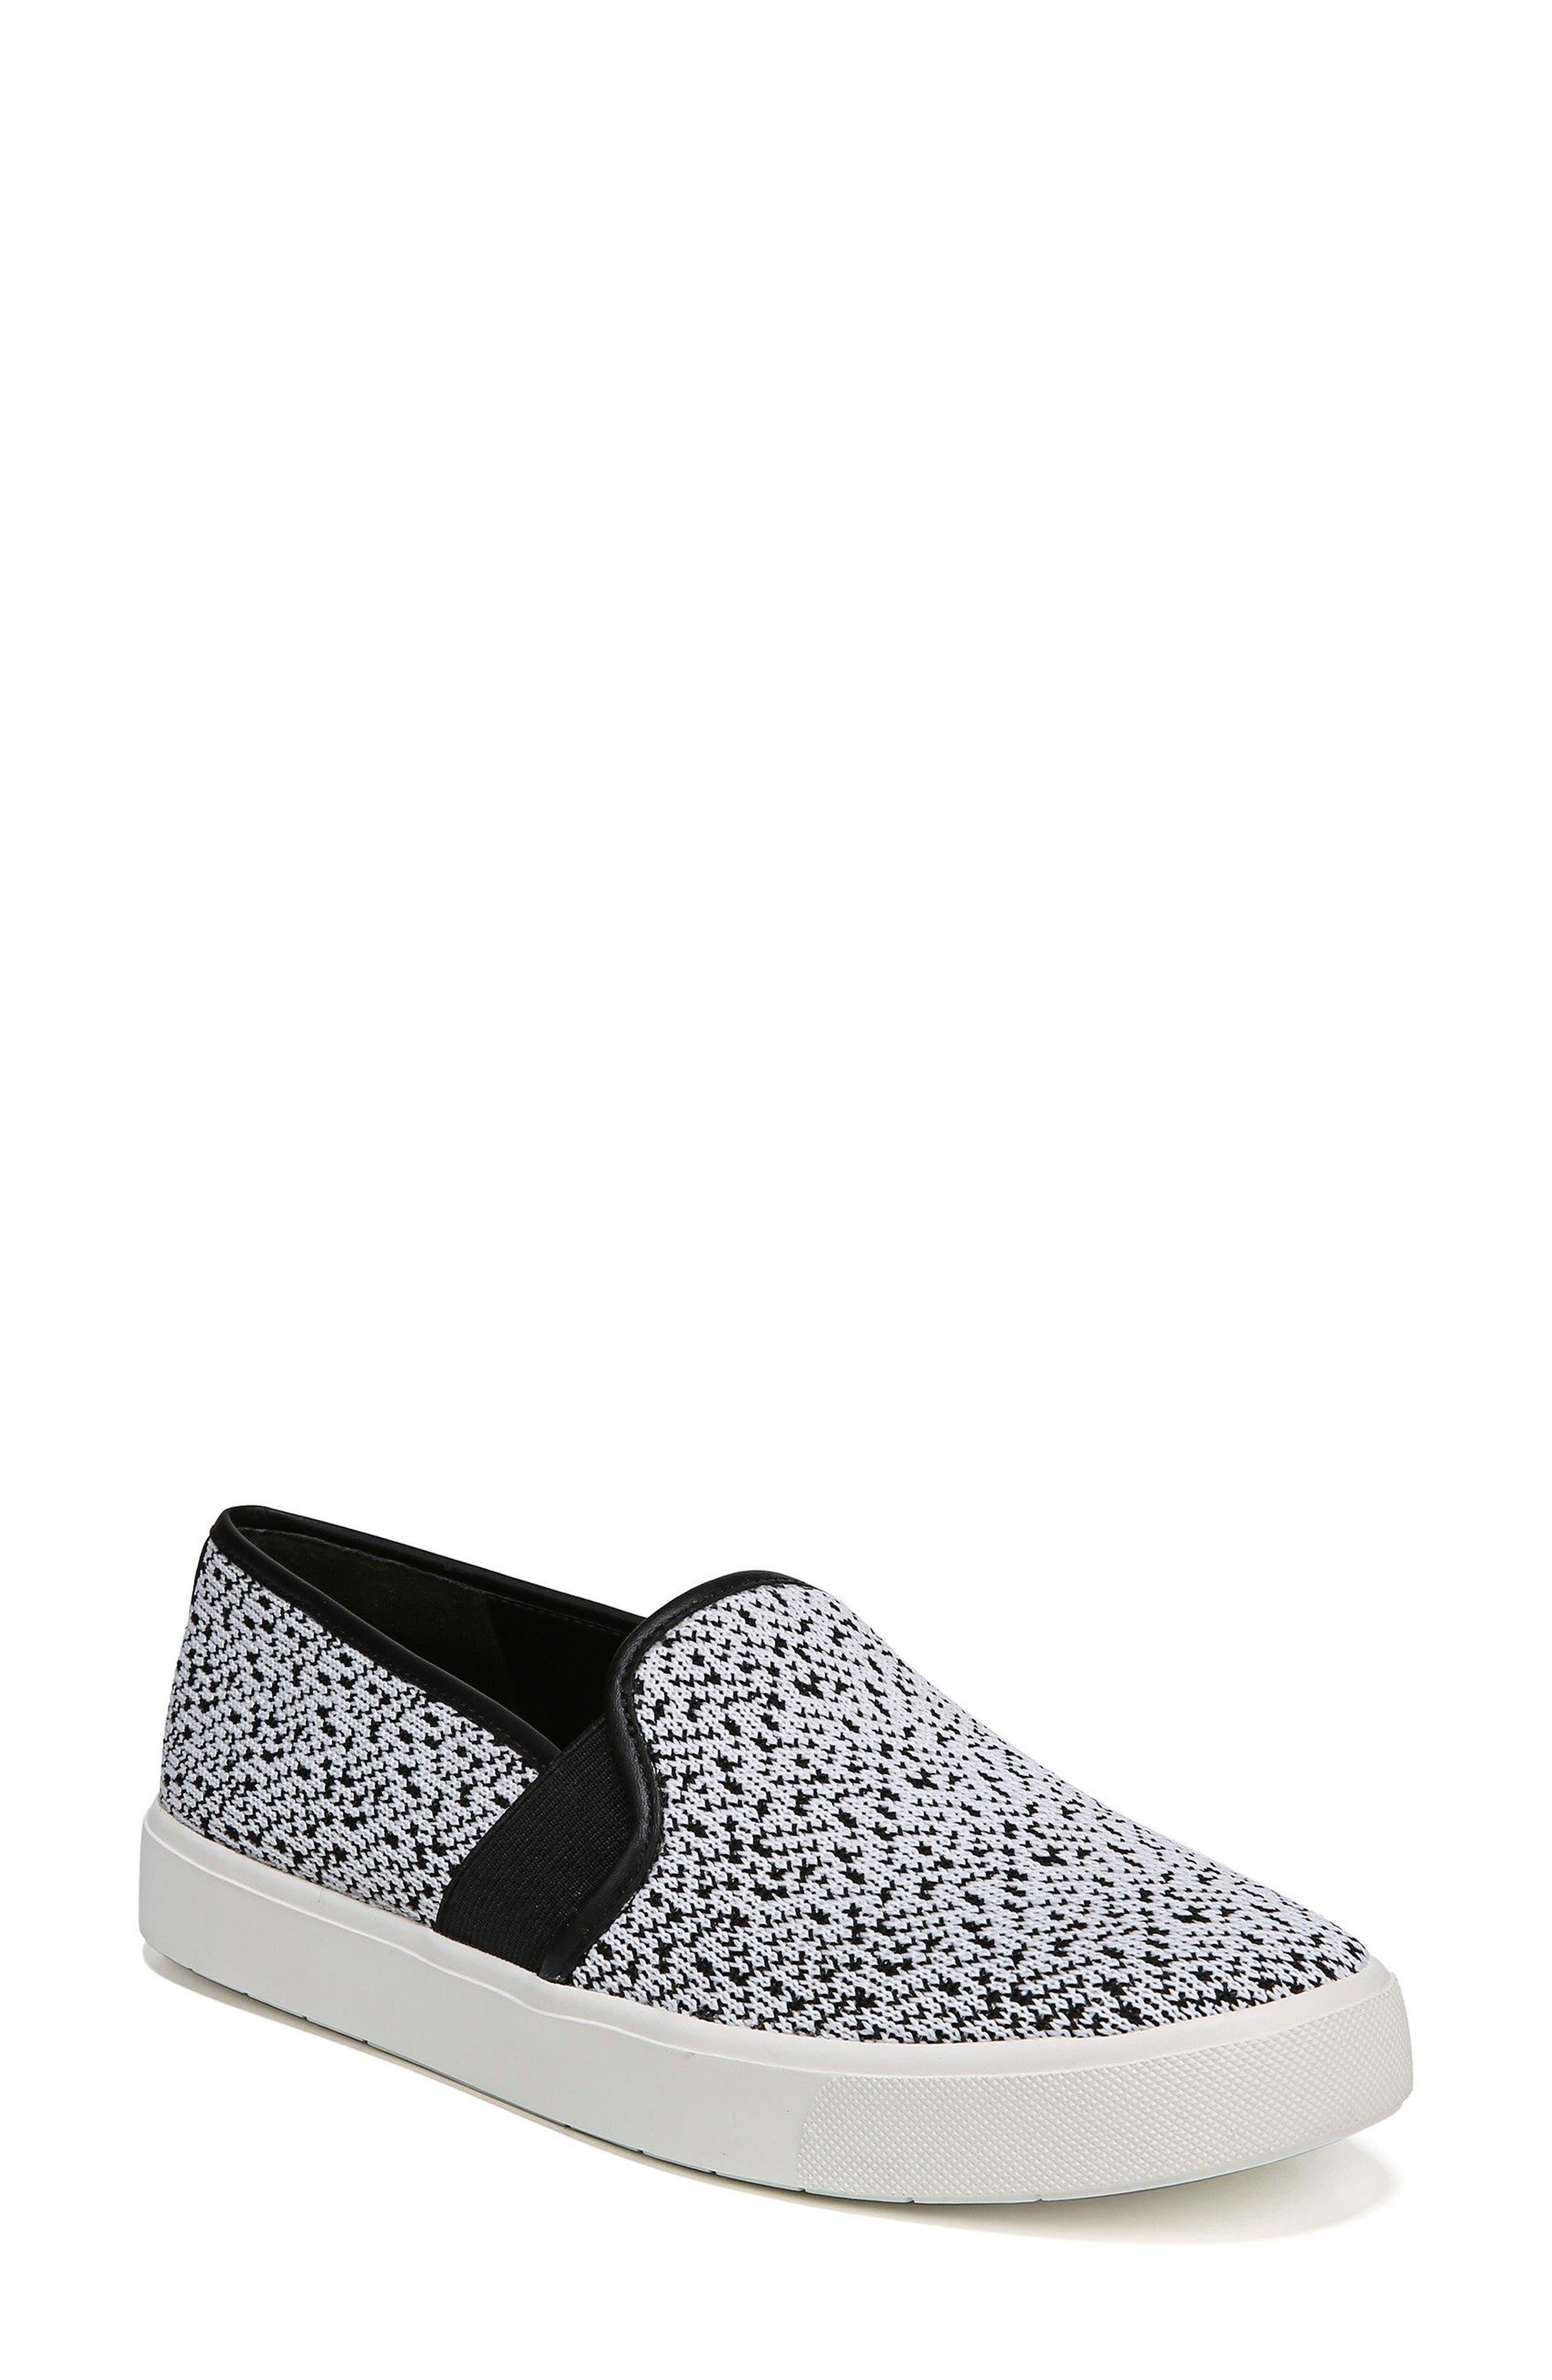 'Blair 12' Leather Slip-On Sneaker,                         Main,                         color, WHITE/ BLACK YETI KNIT